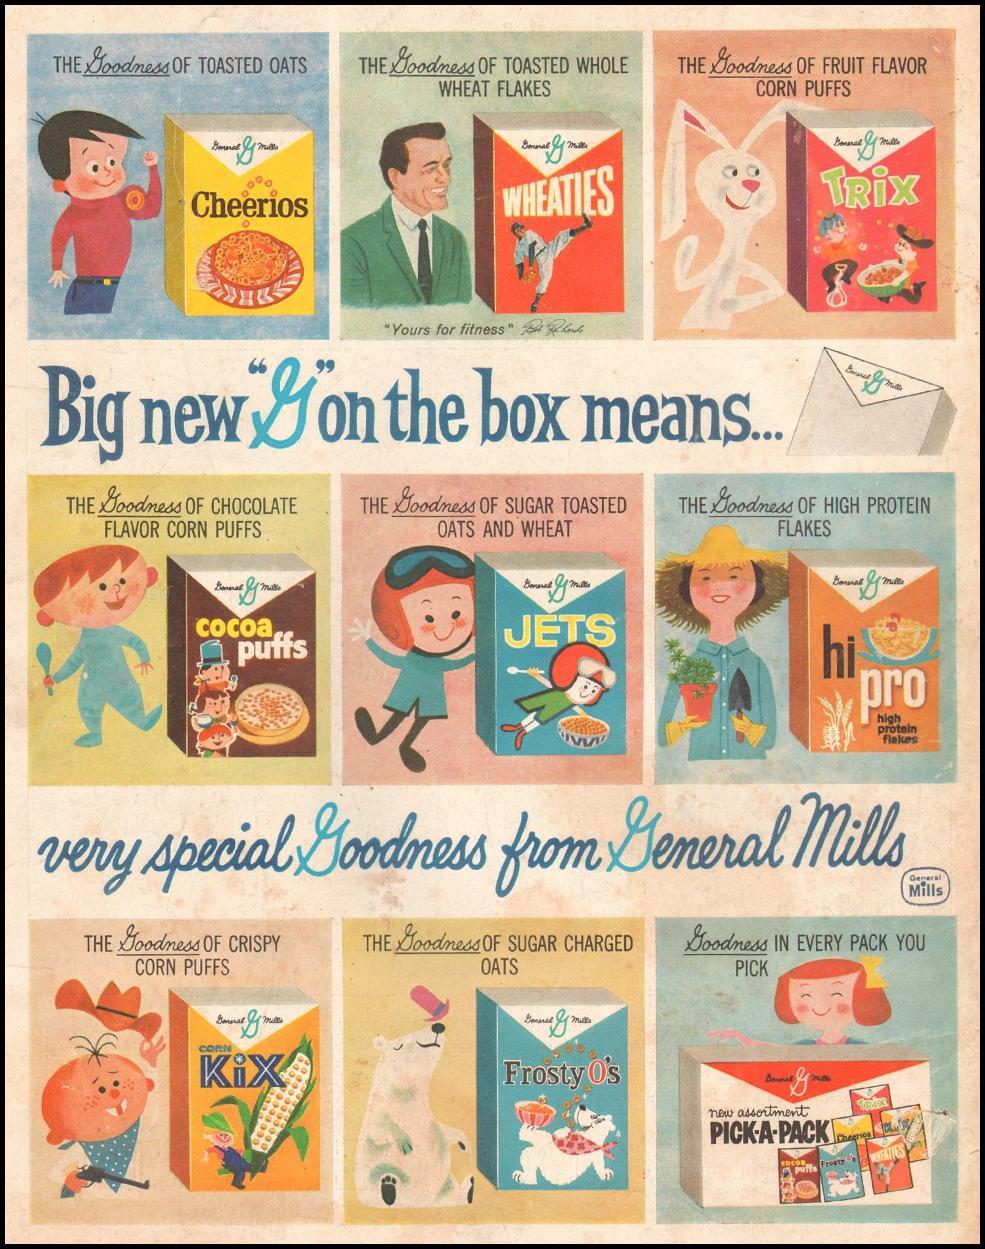 GENERAL MILLS CEREALS SATURDAY EVENING POST 06/11/1960 BACK COVER